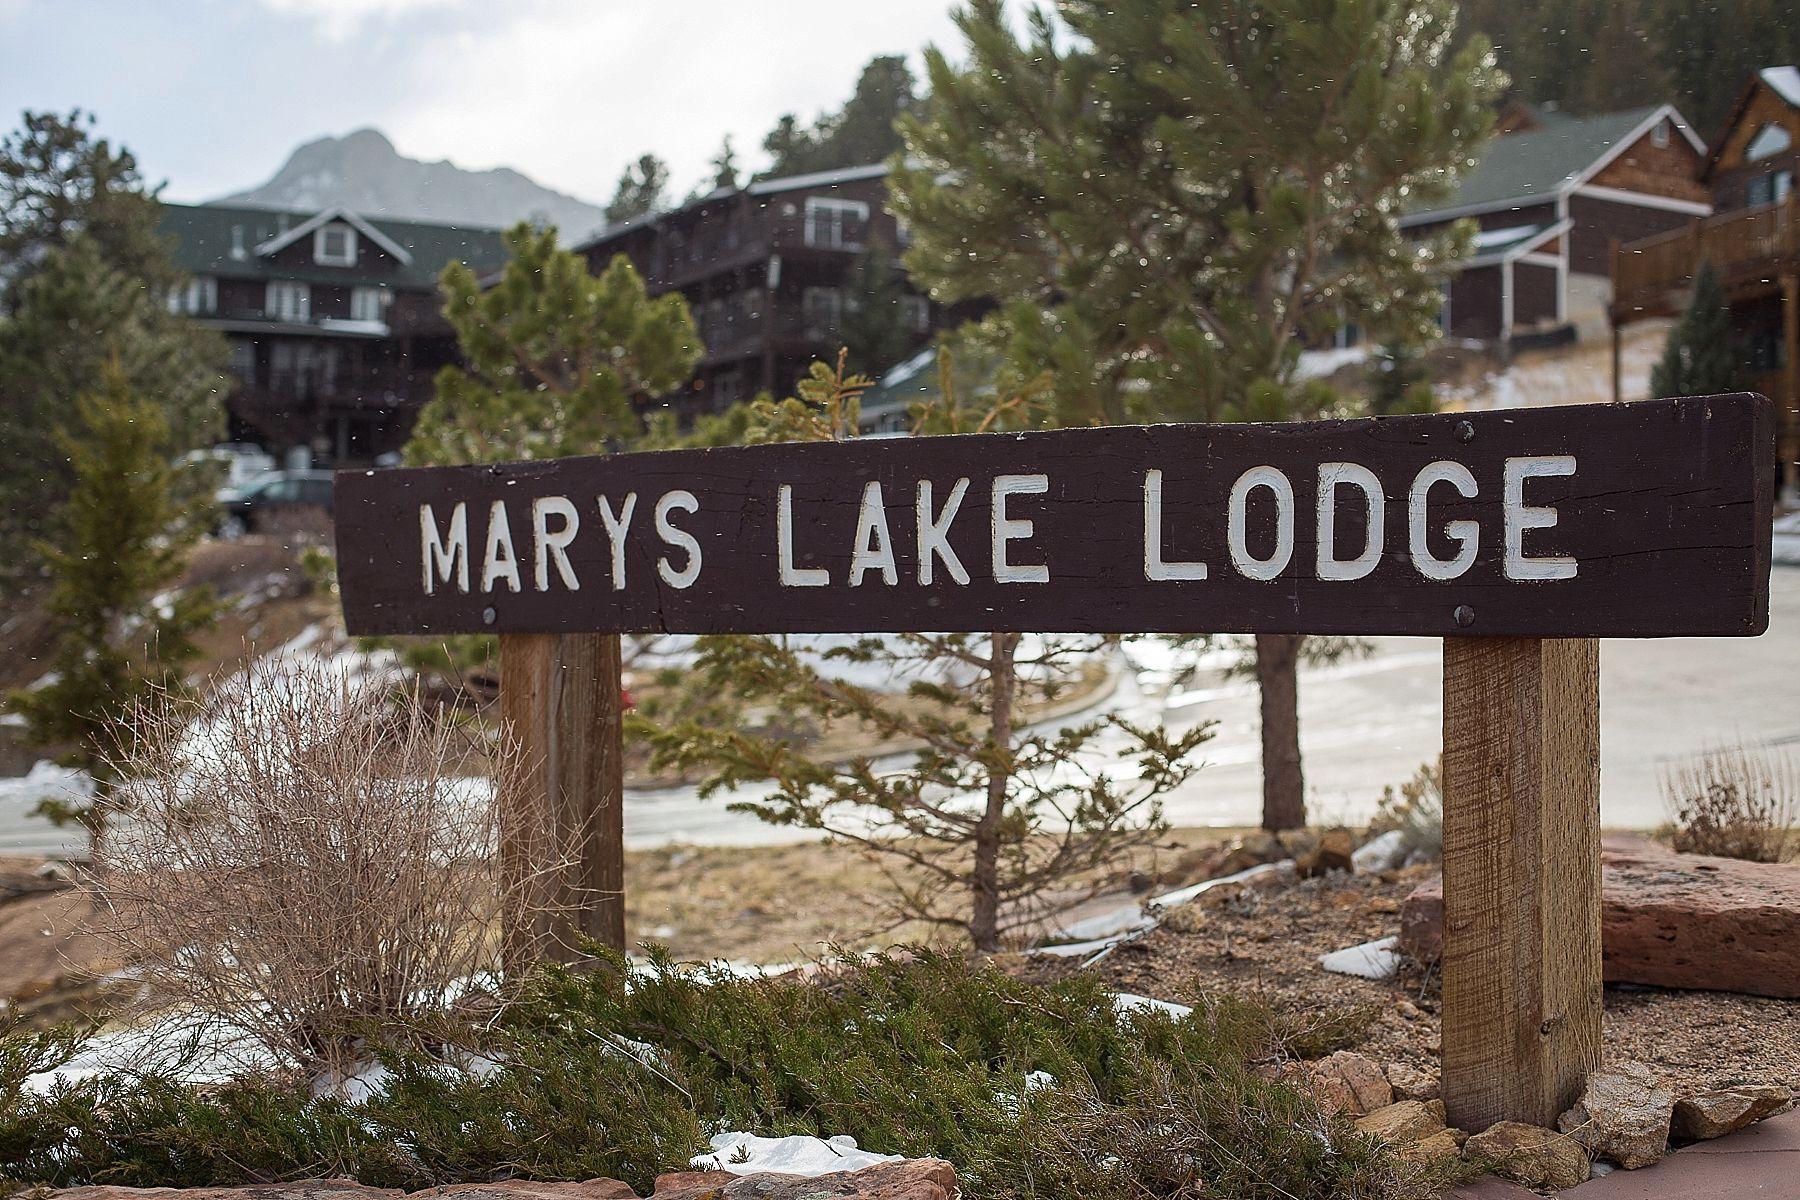 Marys Lake Lodge Winter Wedding, Estes park, Colorado